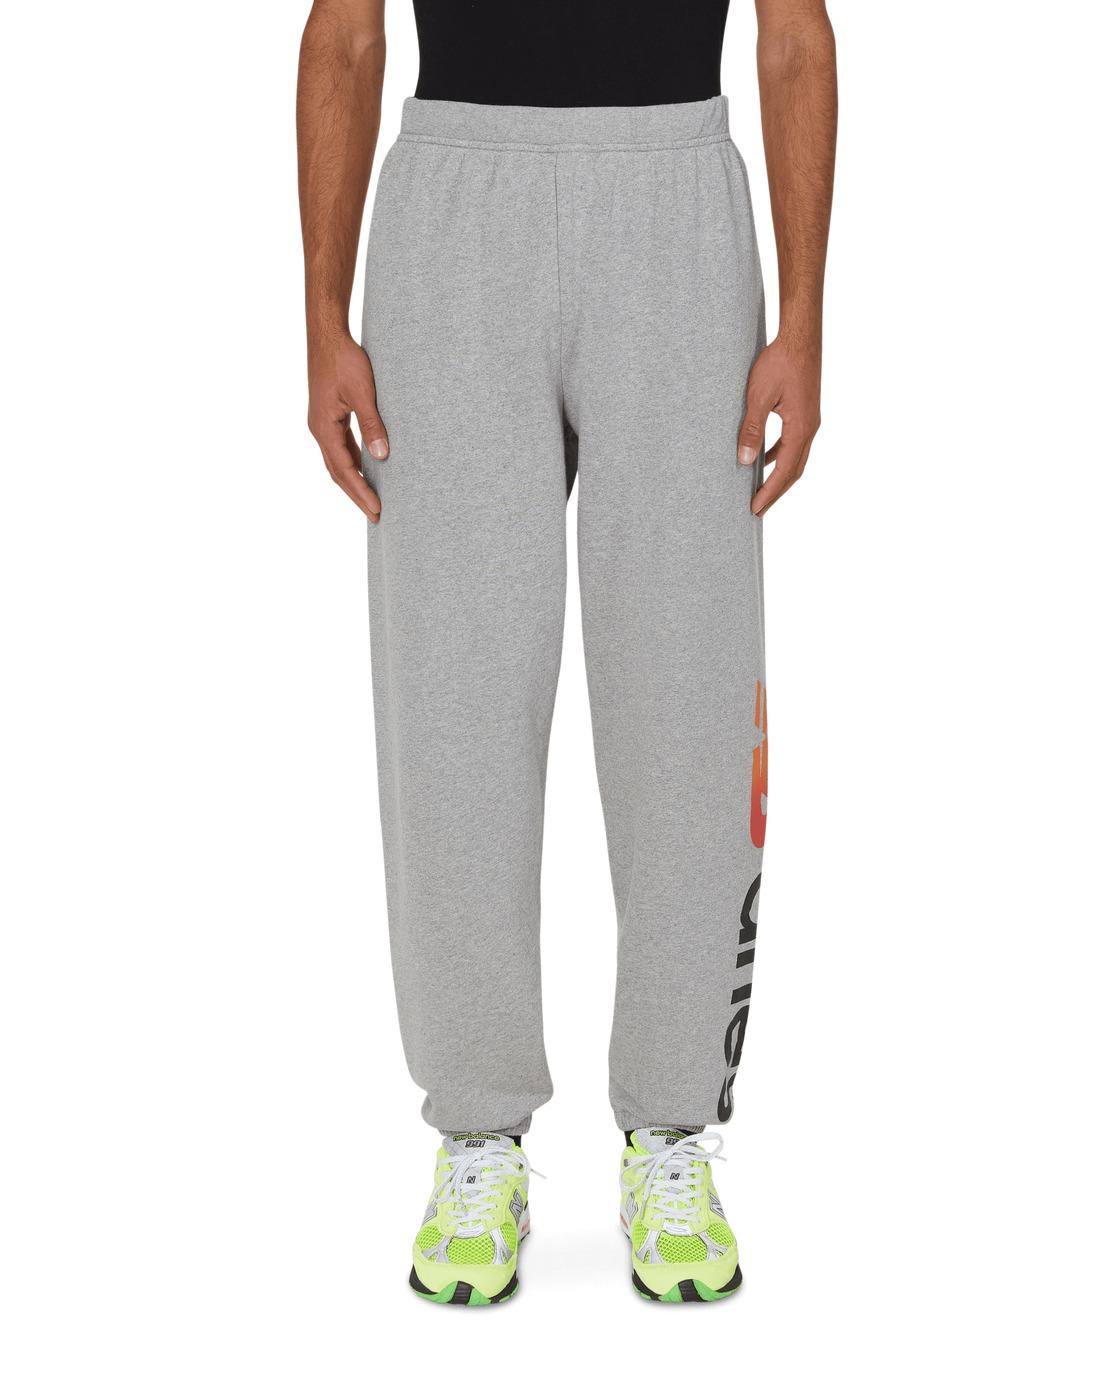 Aries New Balance Sweatpants Grey Heather